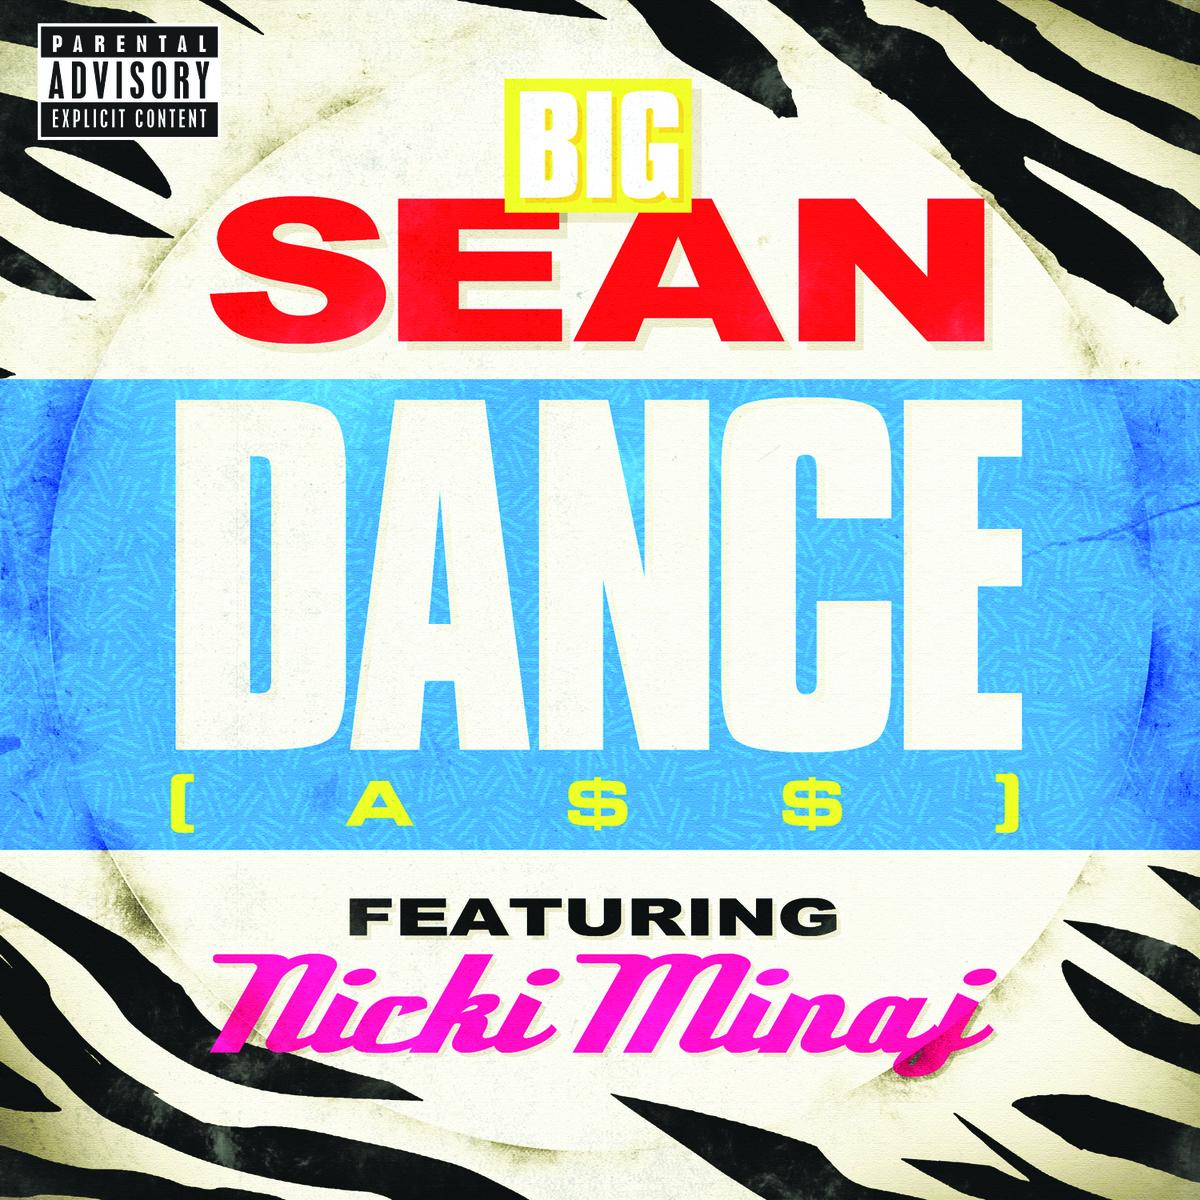 http://4.bp.blogspot.com/-z3Dr9cdYQME/TrDUbVFJpFI/AAAAAAAABfo/2unrfNTaTaw/s1600/Big+Sean+-+Dance+%2528A%2524%2524%2529.png